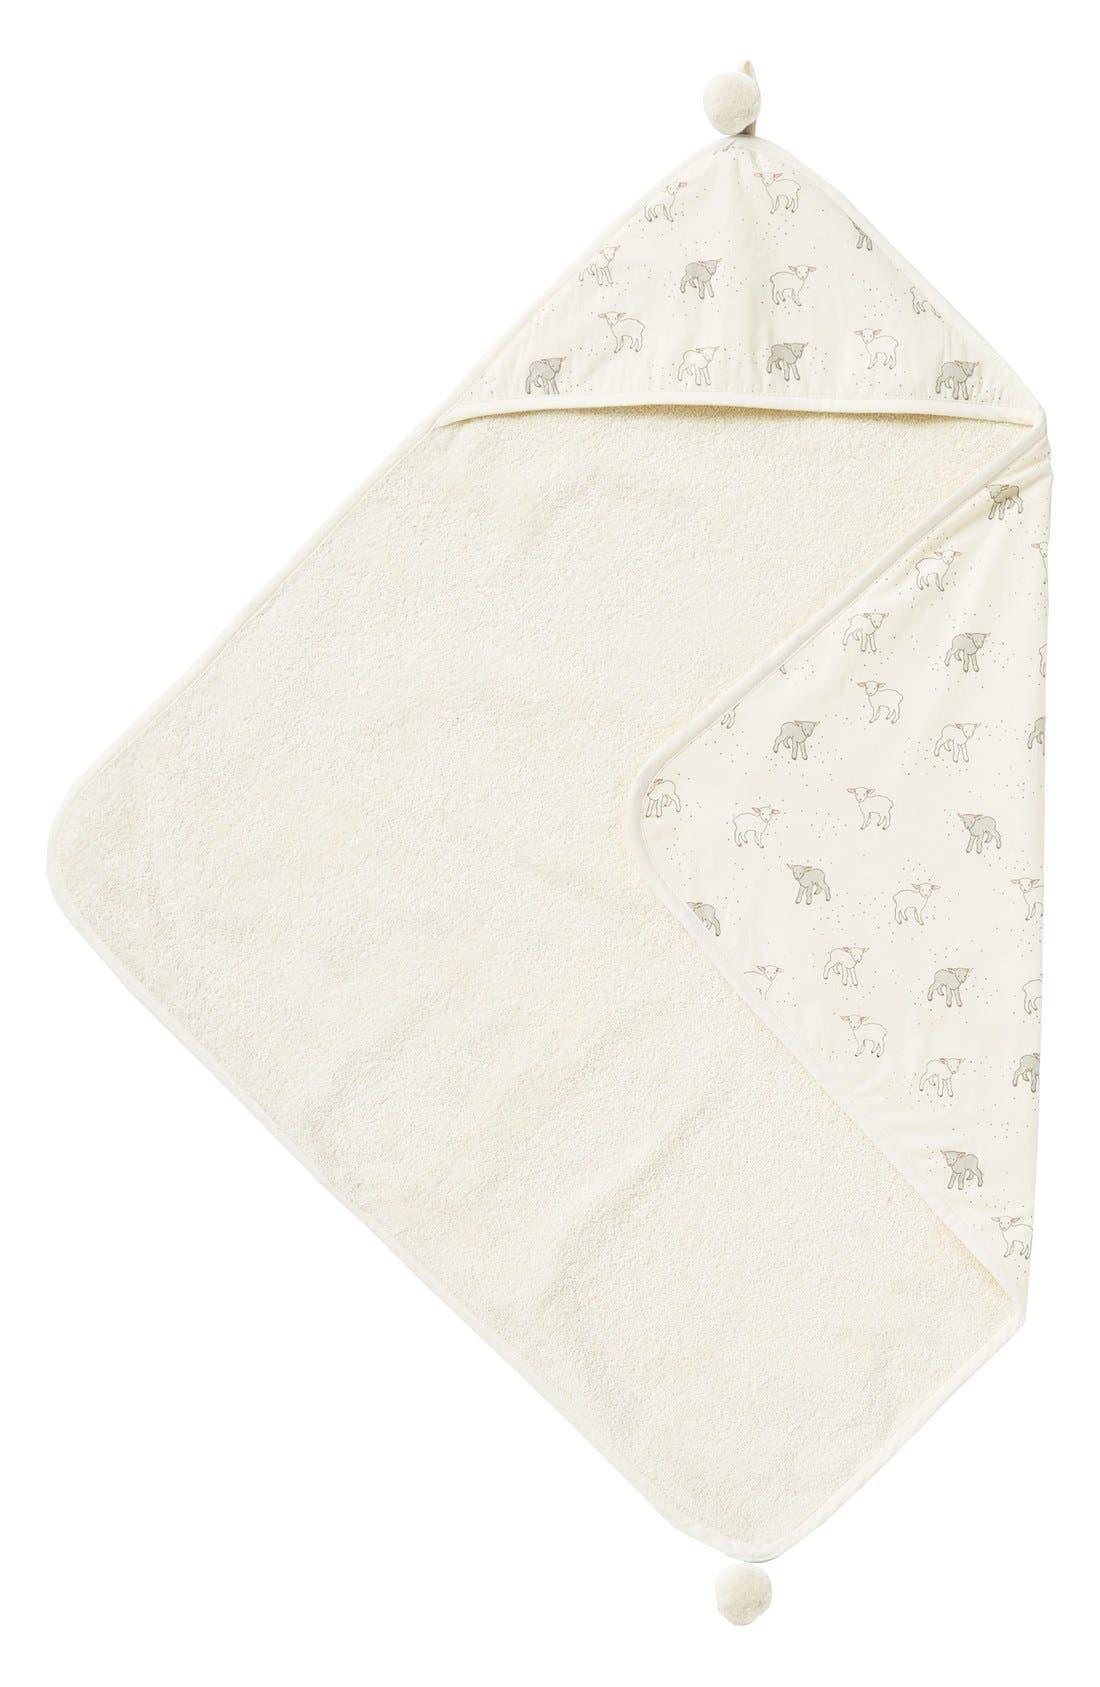 Little Lamb Print Hooded Towel,                             Main thumbnail 1, color,                             Cream